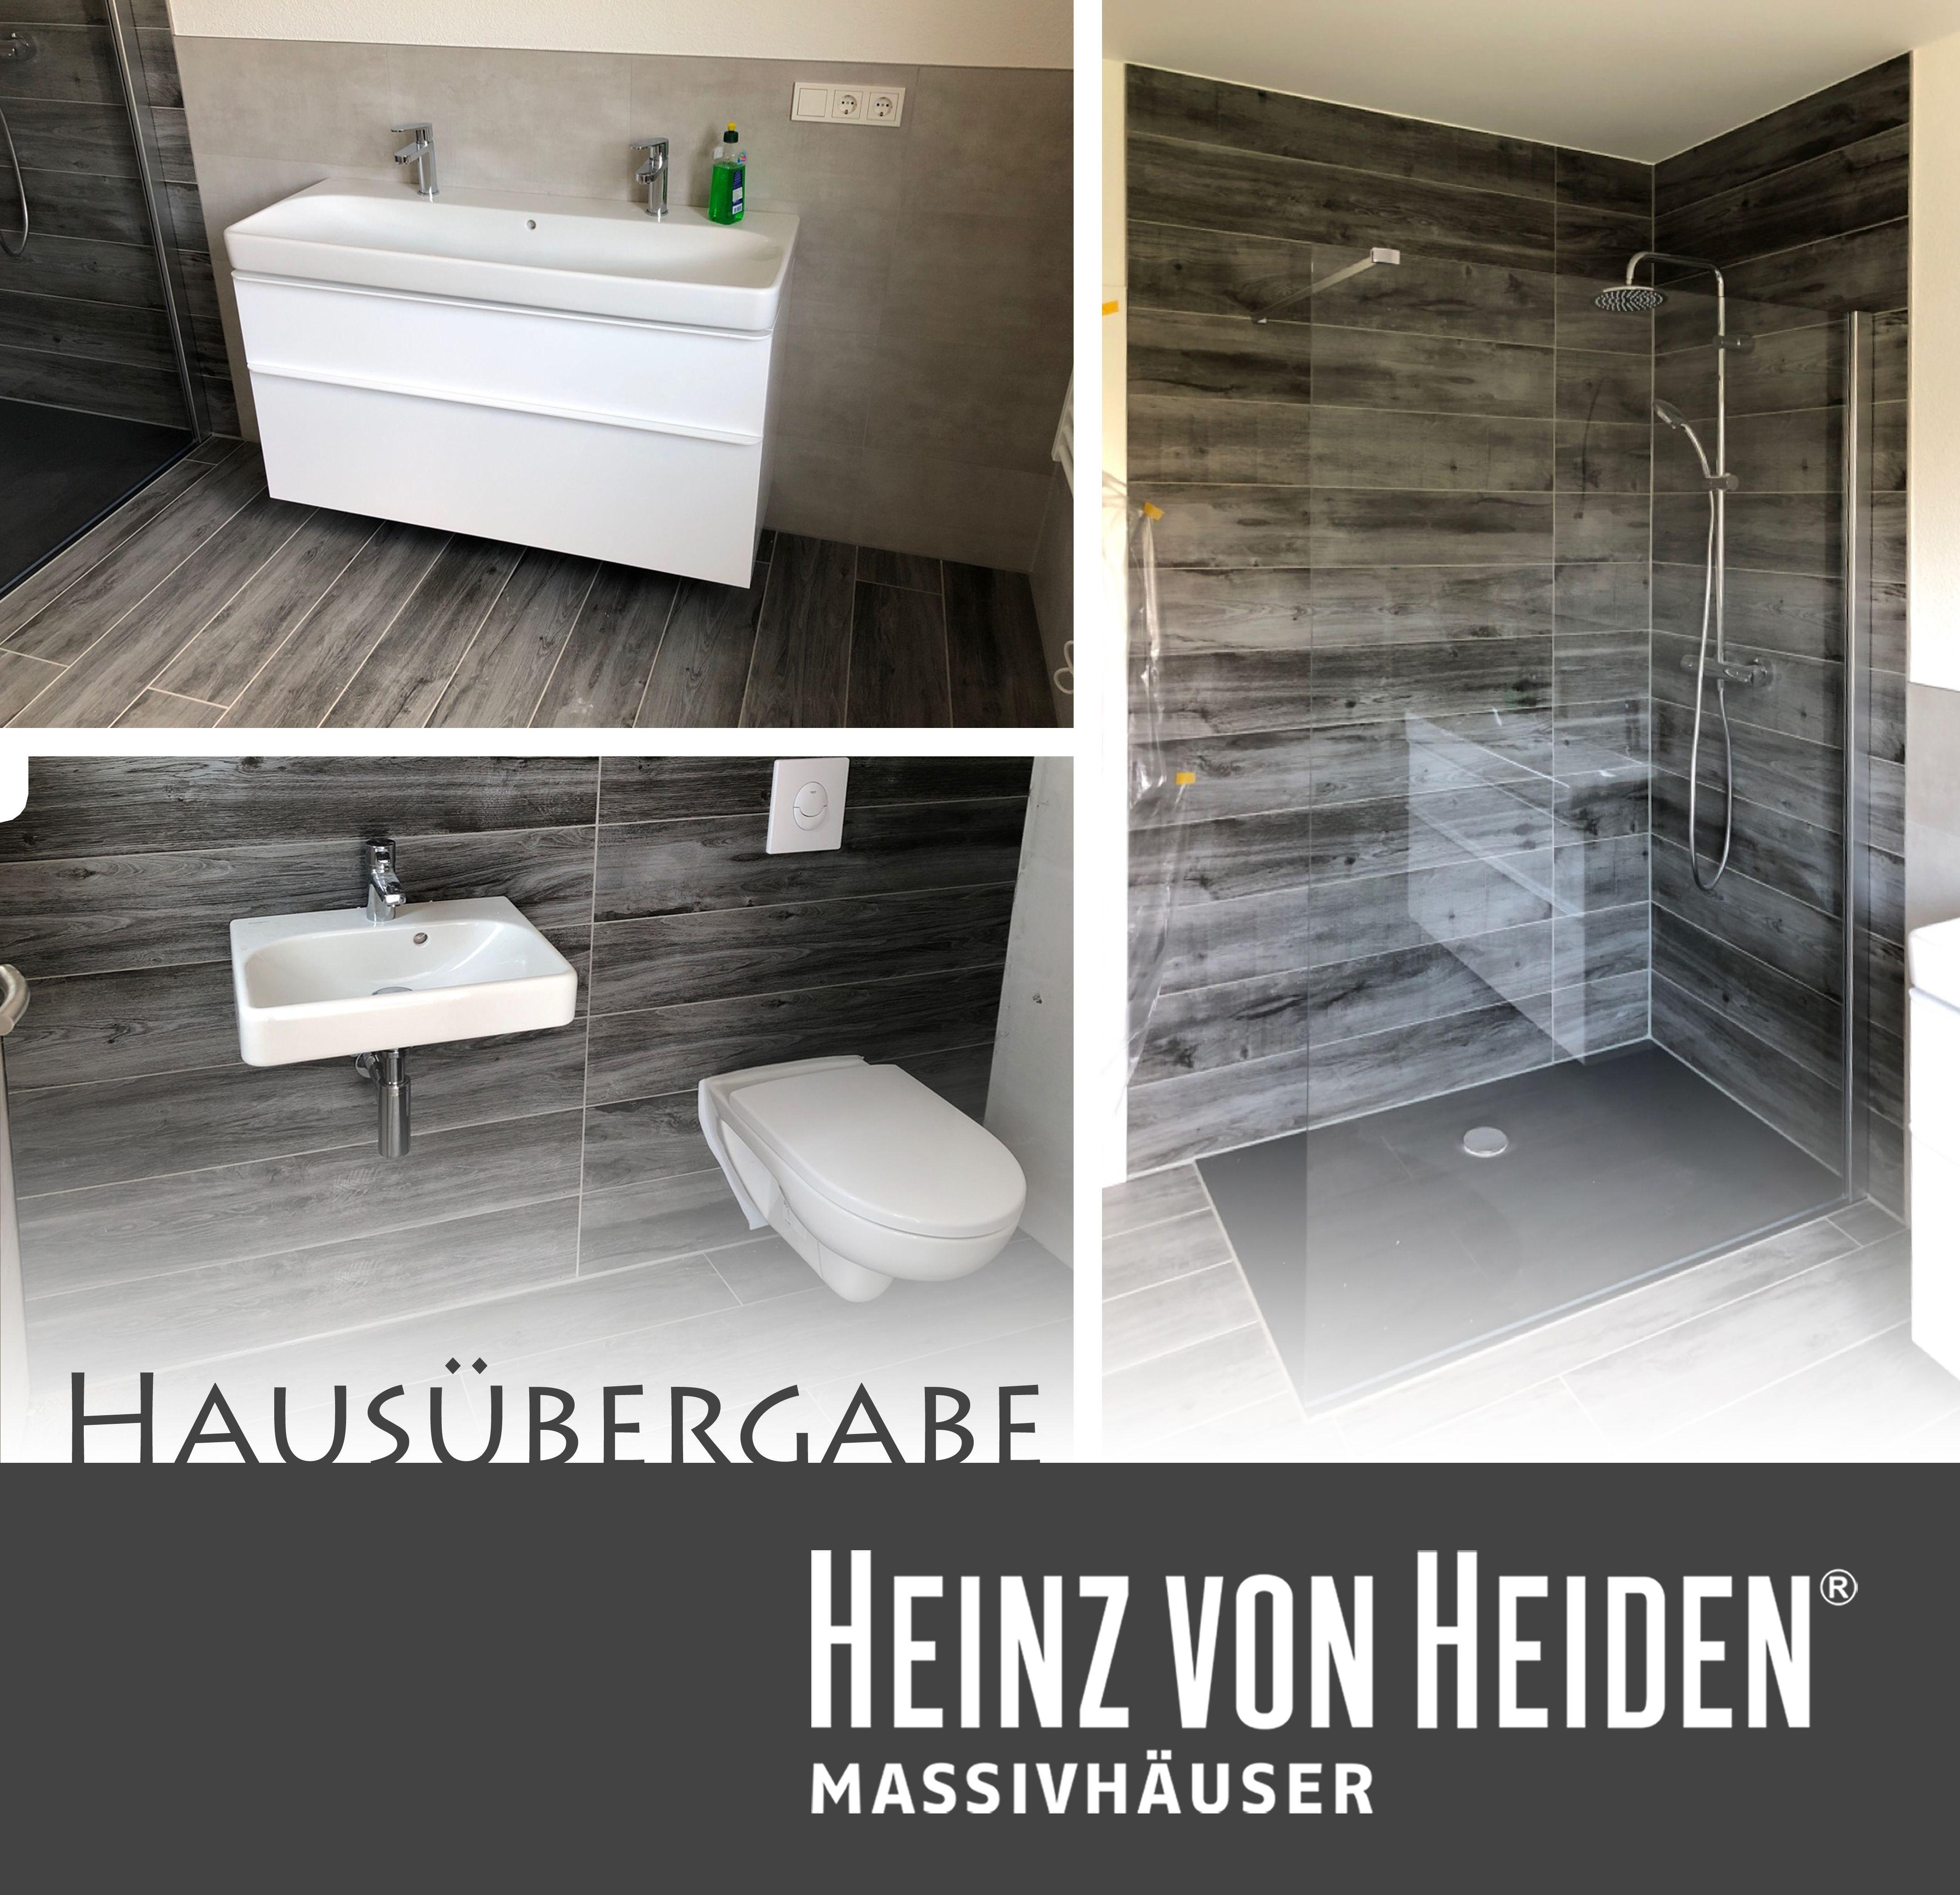 Badezimmer Ideen In 2020 Badezimmer Badezimmer Inspiration Zimmer